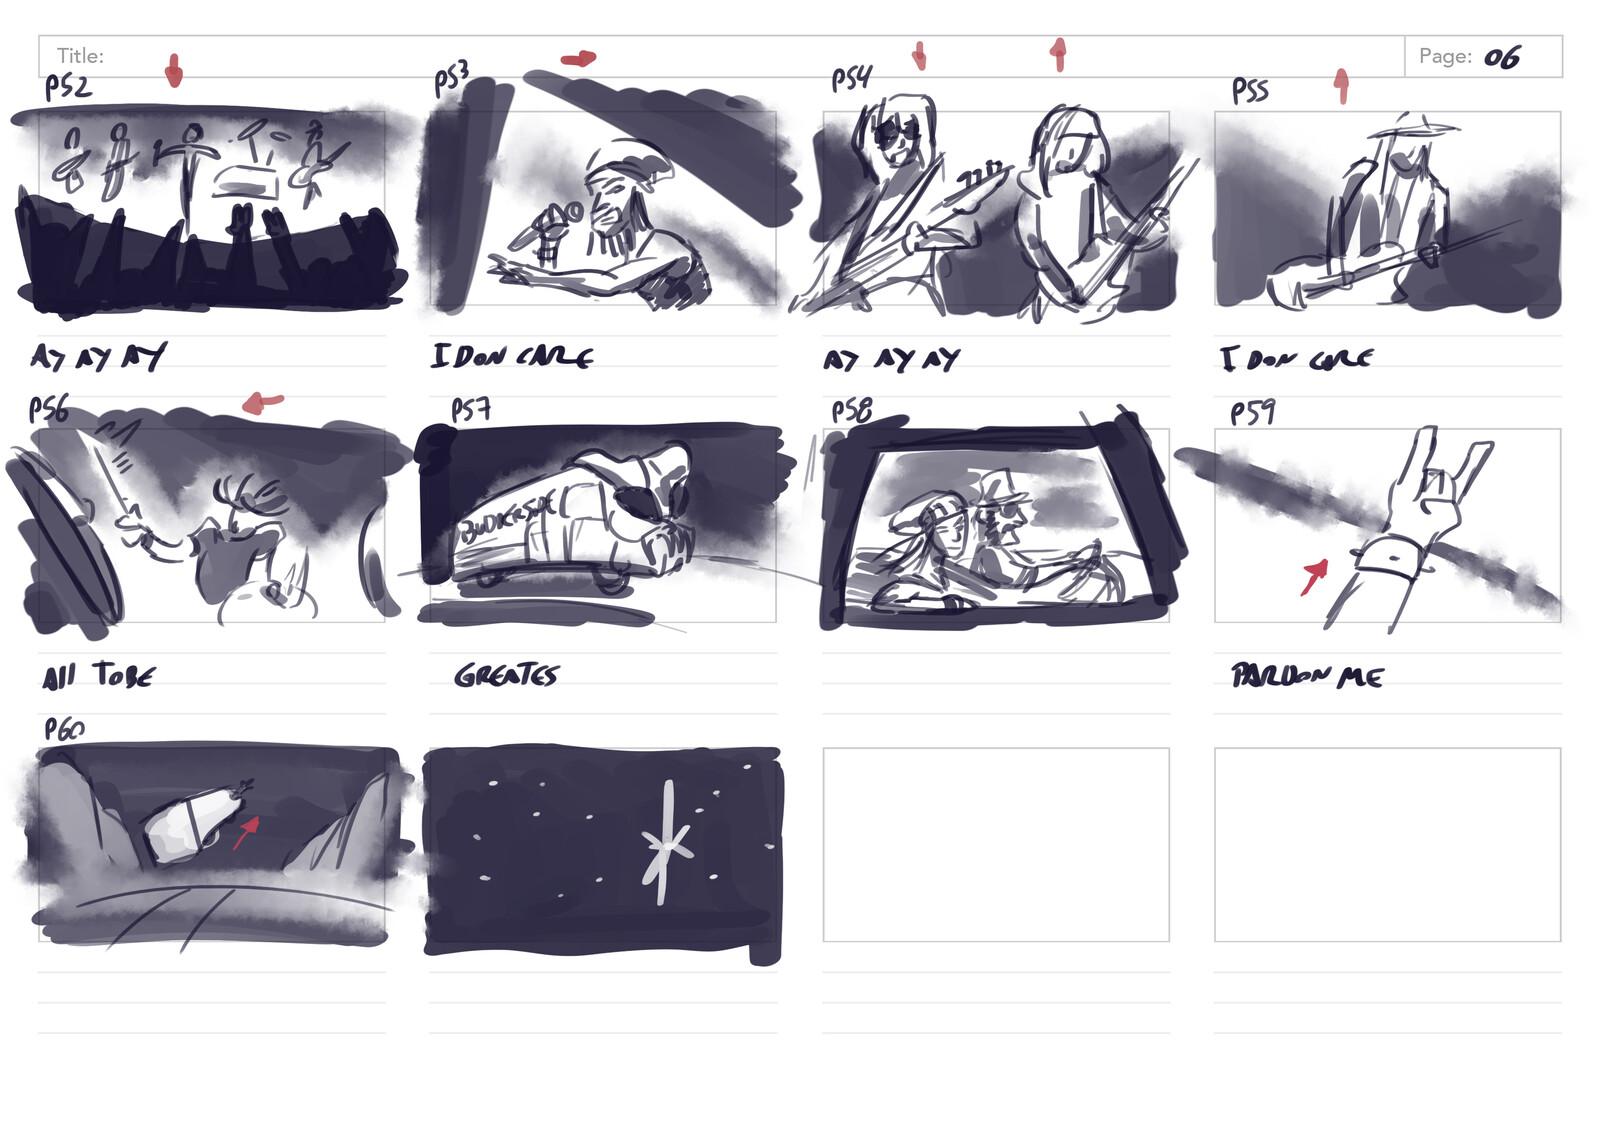 Storyboard 6/6